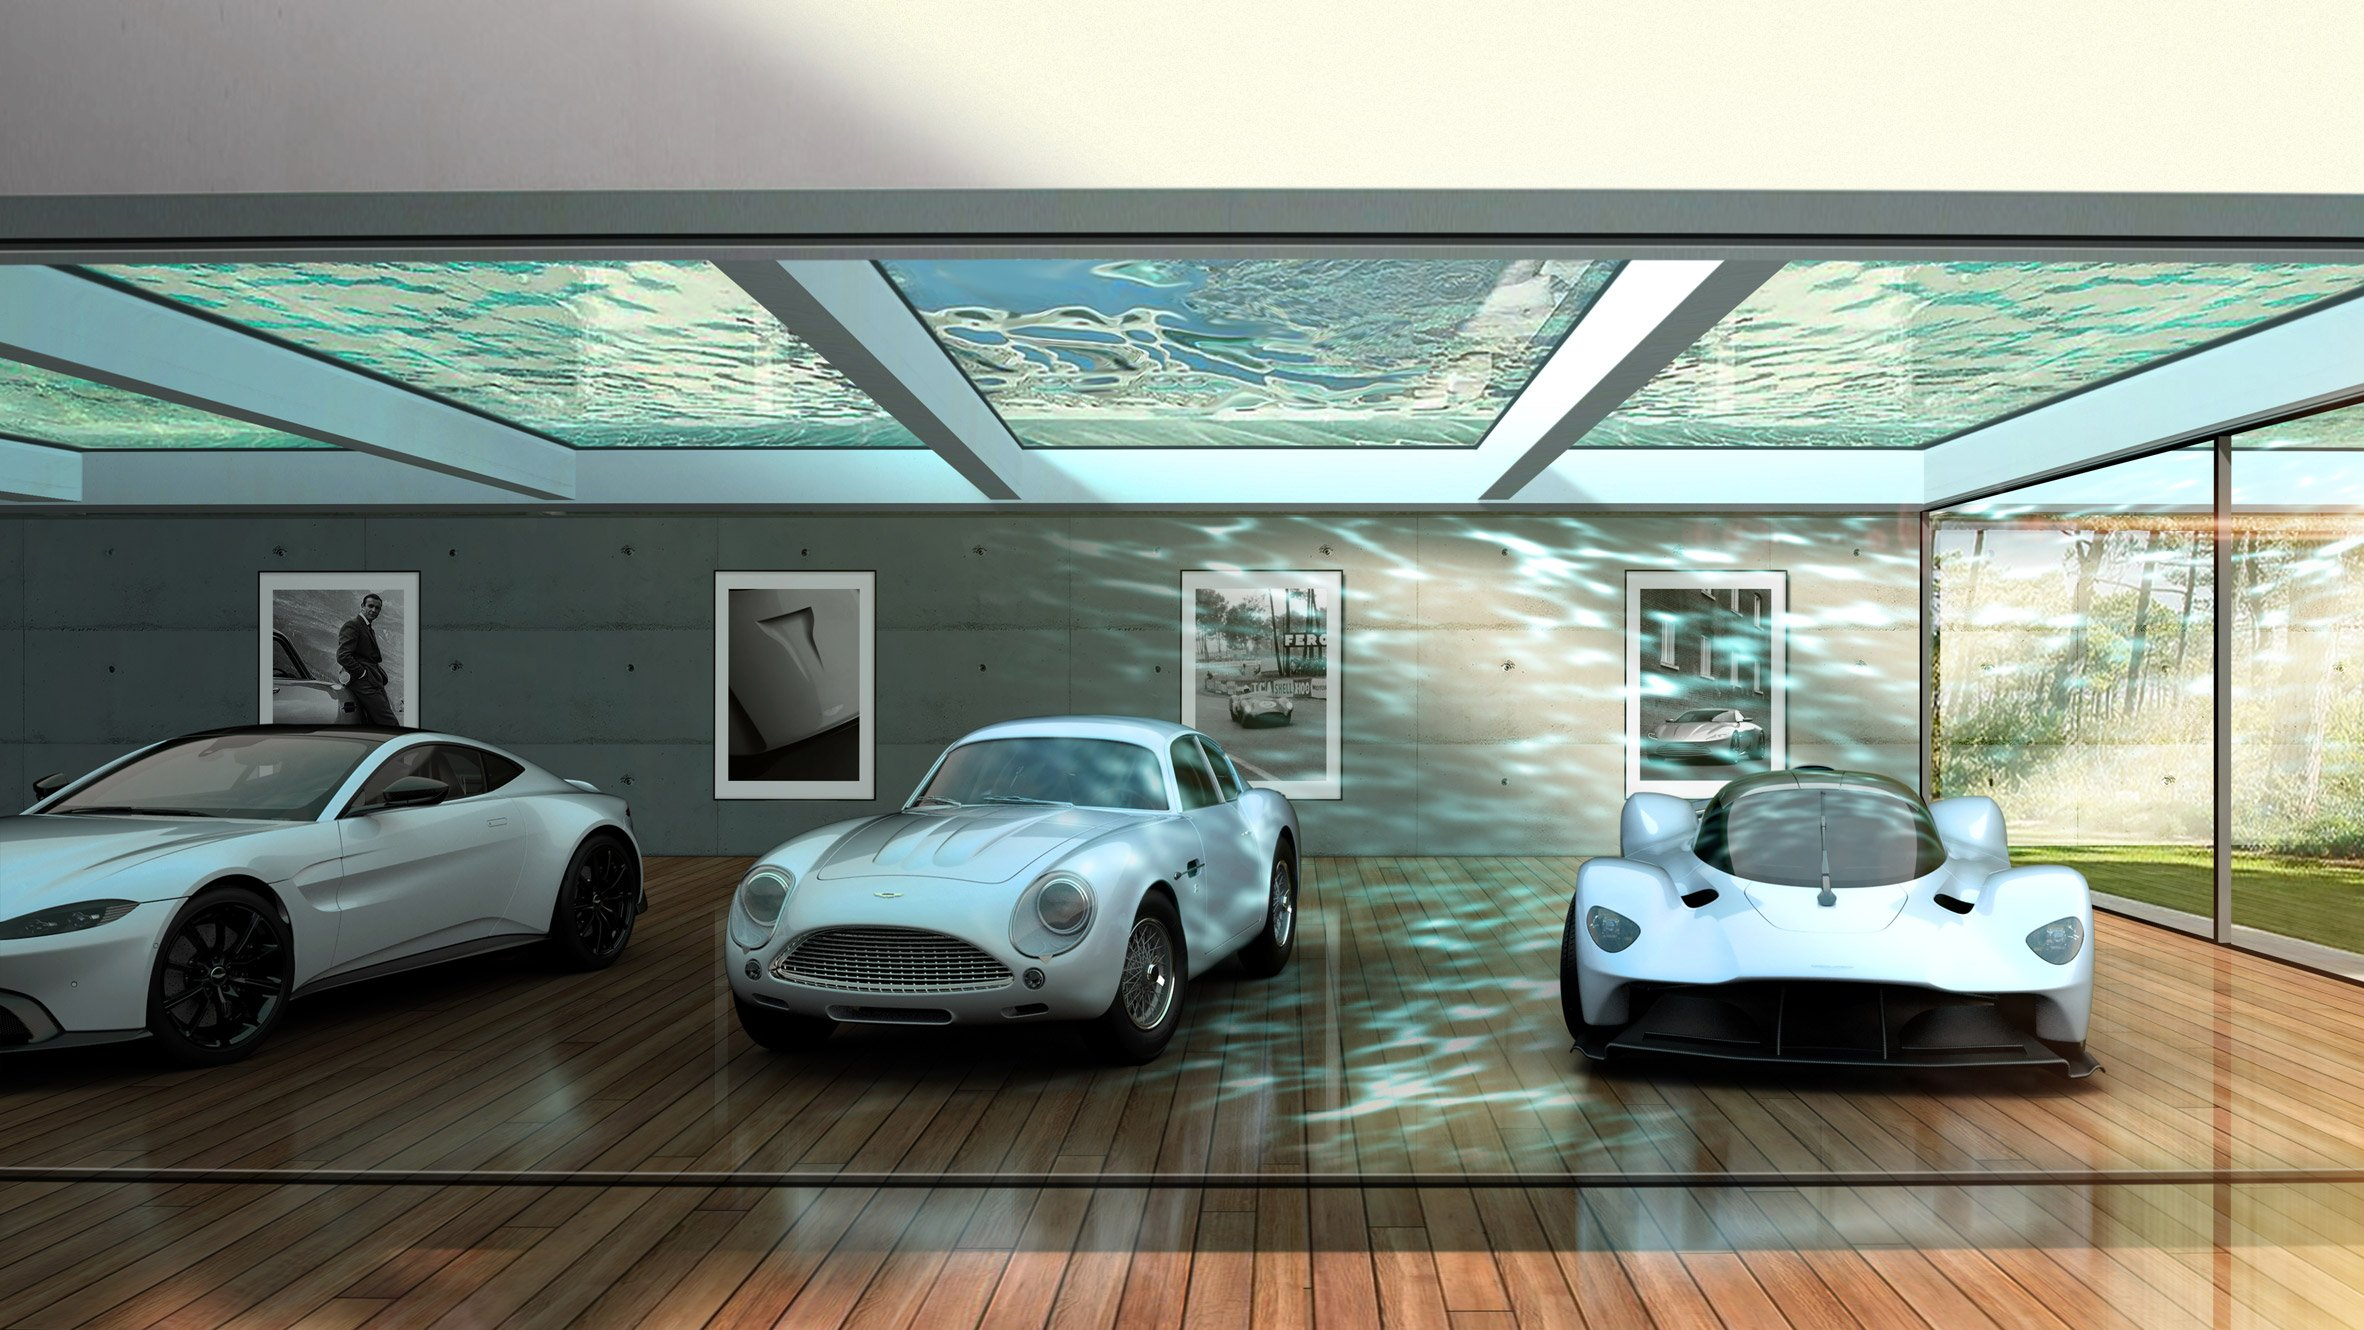 Aston Martin S Architectural Service Will Create Homes Focused Around Cars